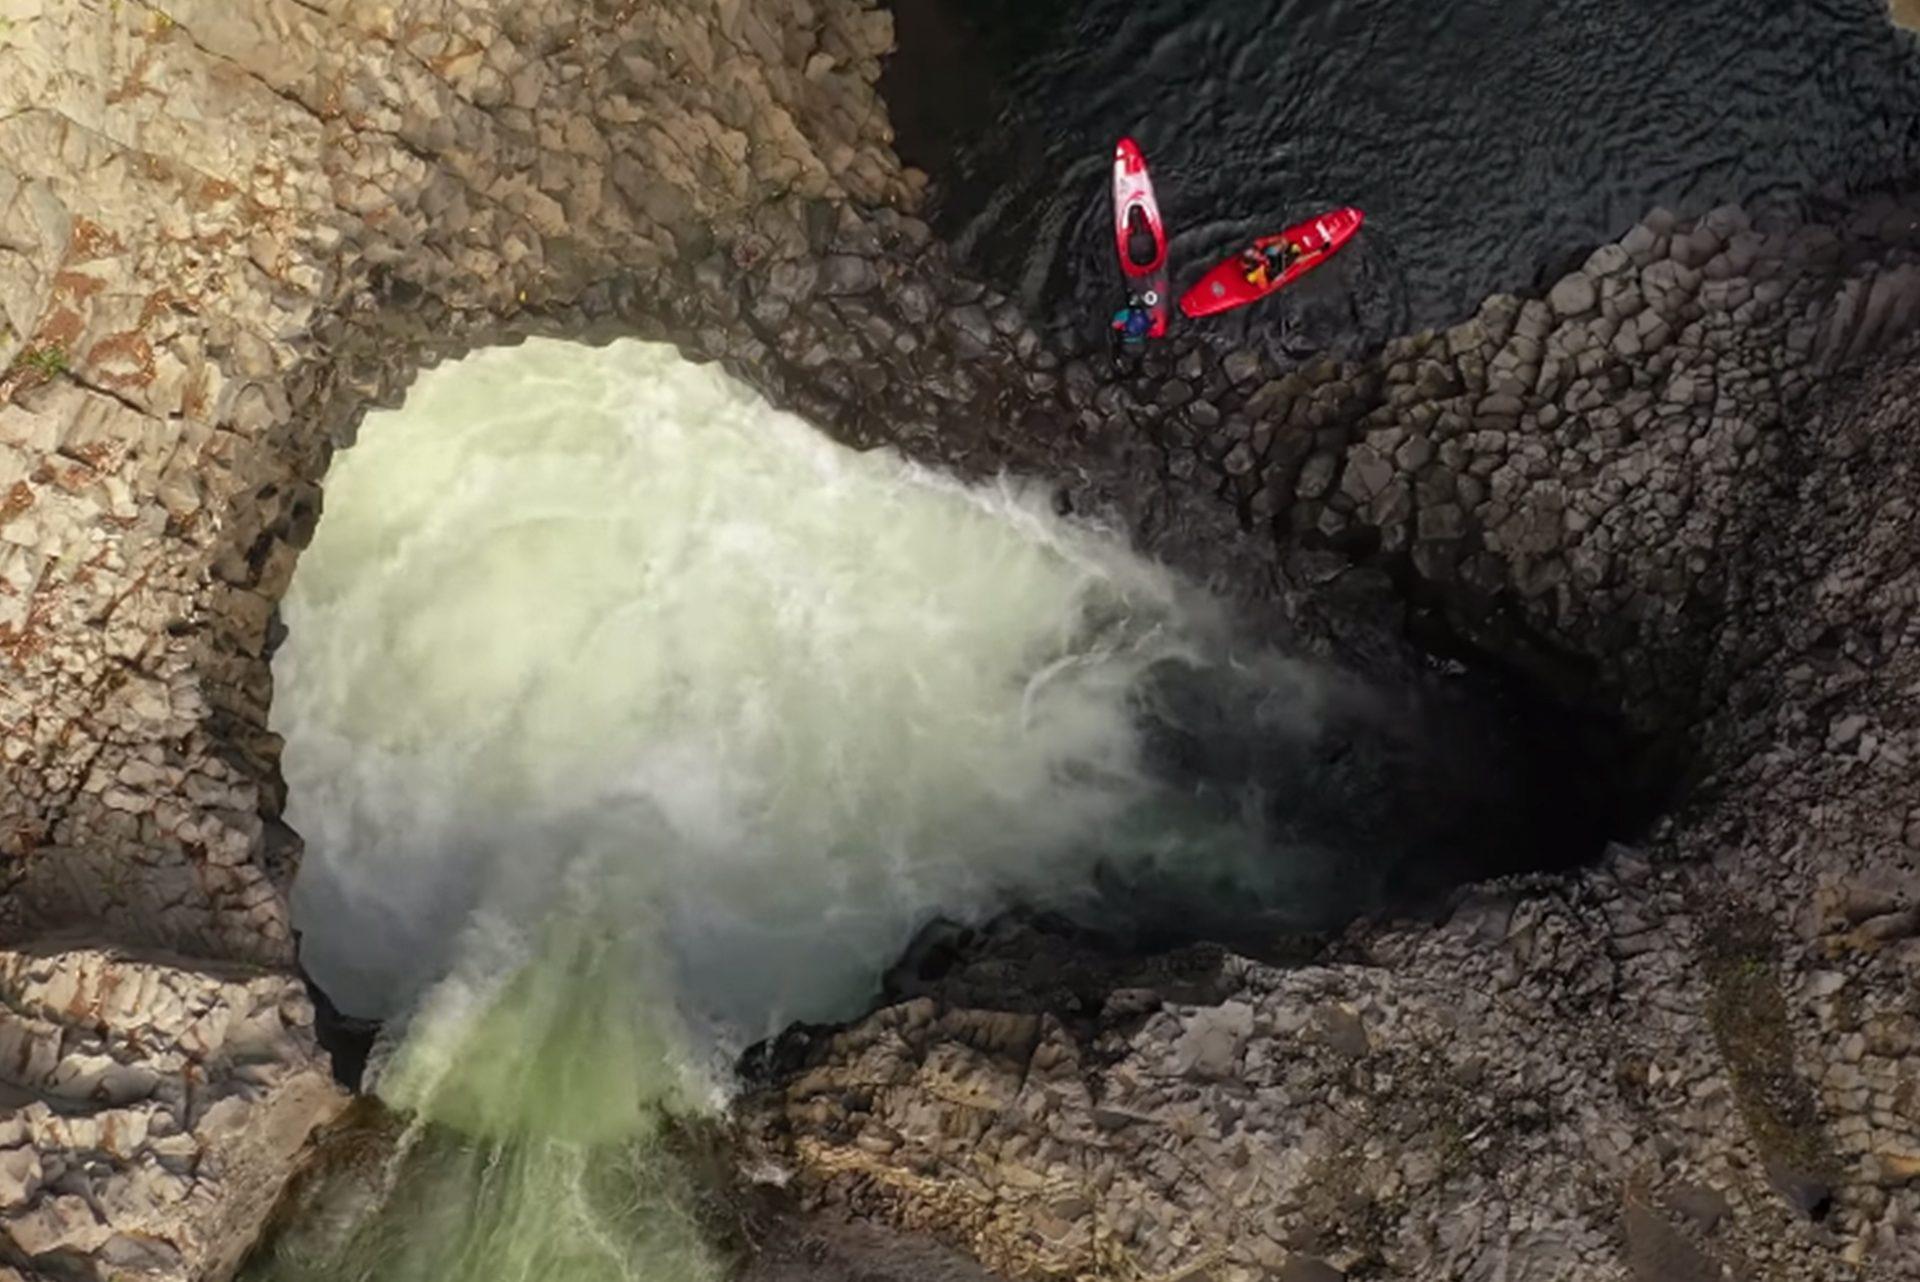 Kayaking waterfalls in Hawaii